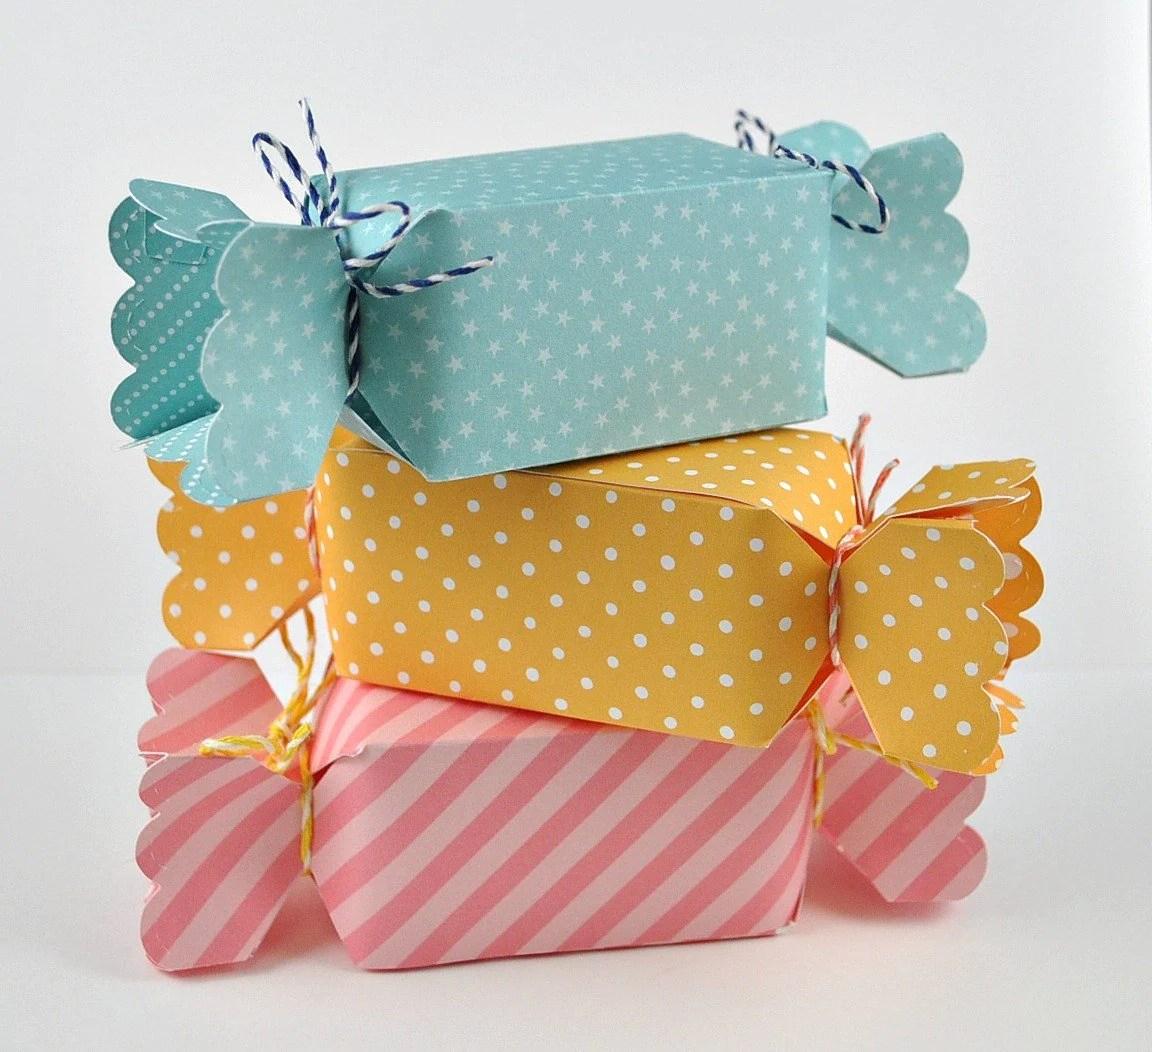 Candy Box Lawn Fawn